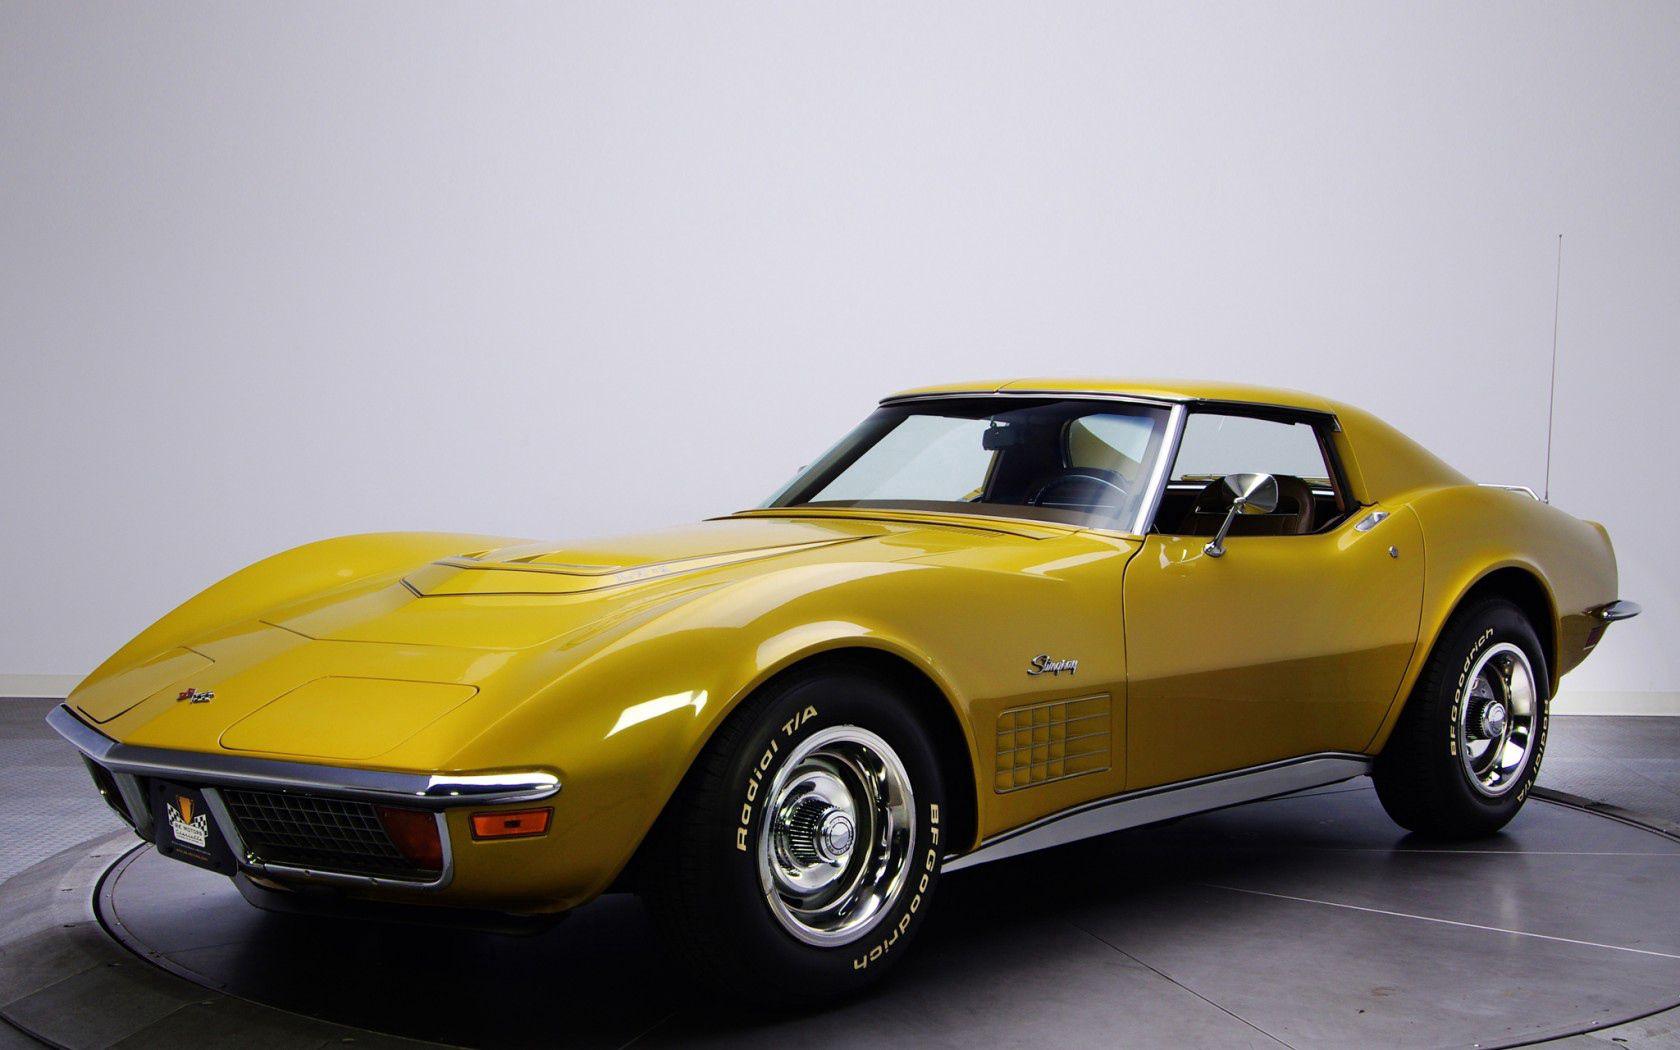 89537 скачать обои Шевроле (Chevrolet), Тачки (Cars), Corvette, 1970, Stingray, C3 - заставки и картинки бесплатно